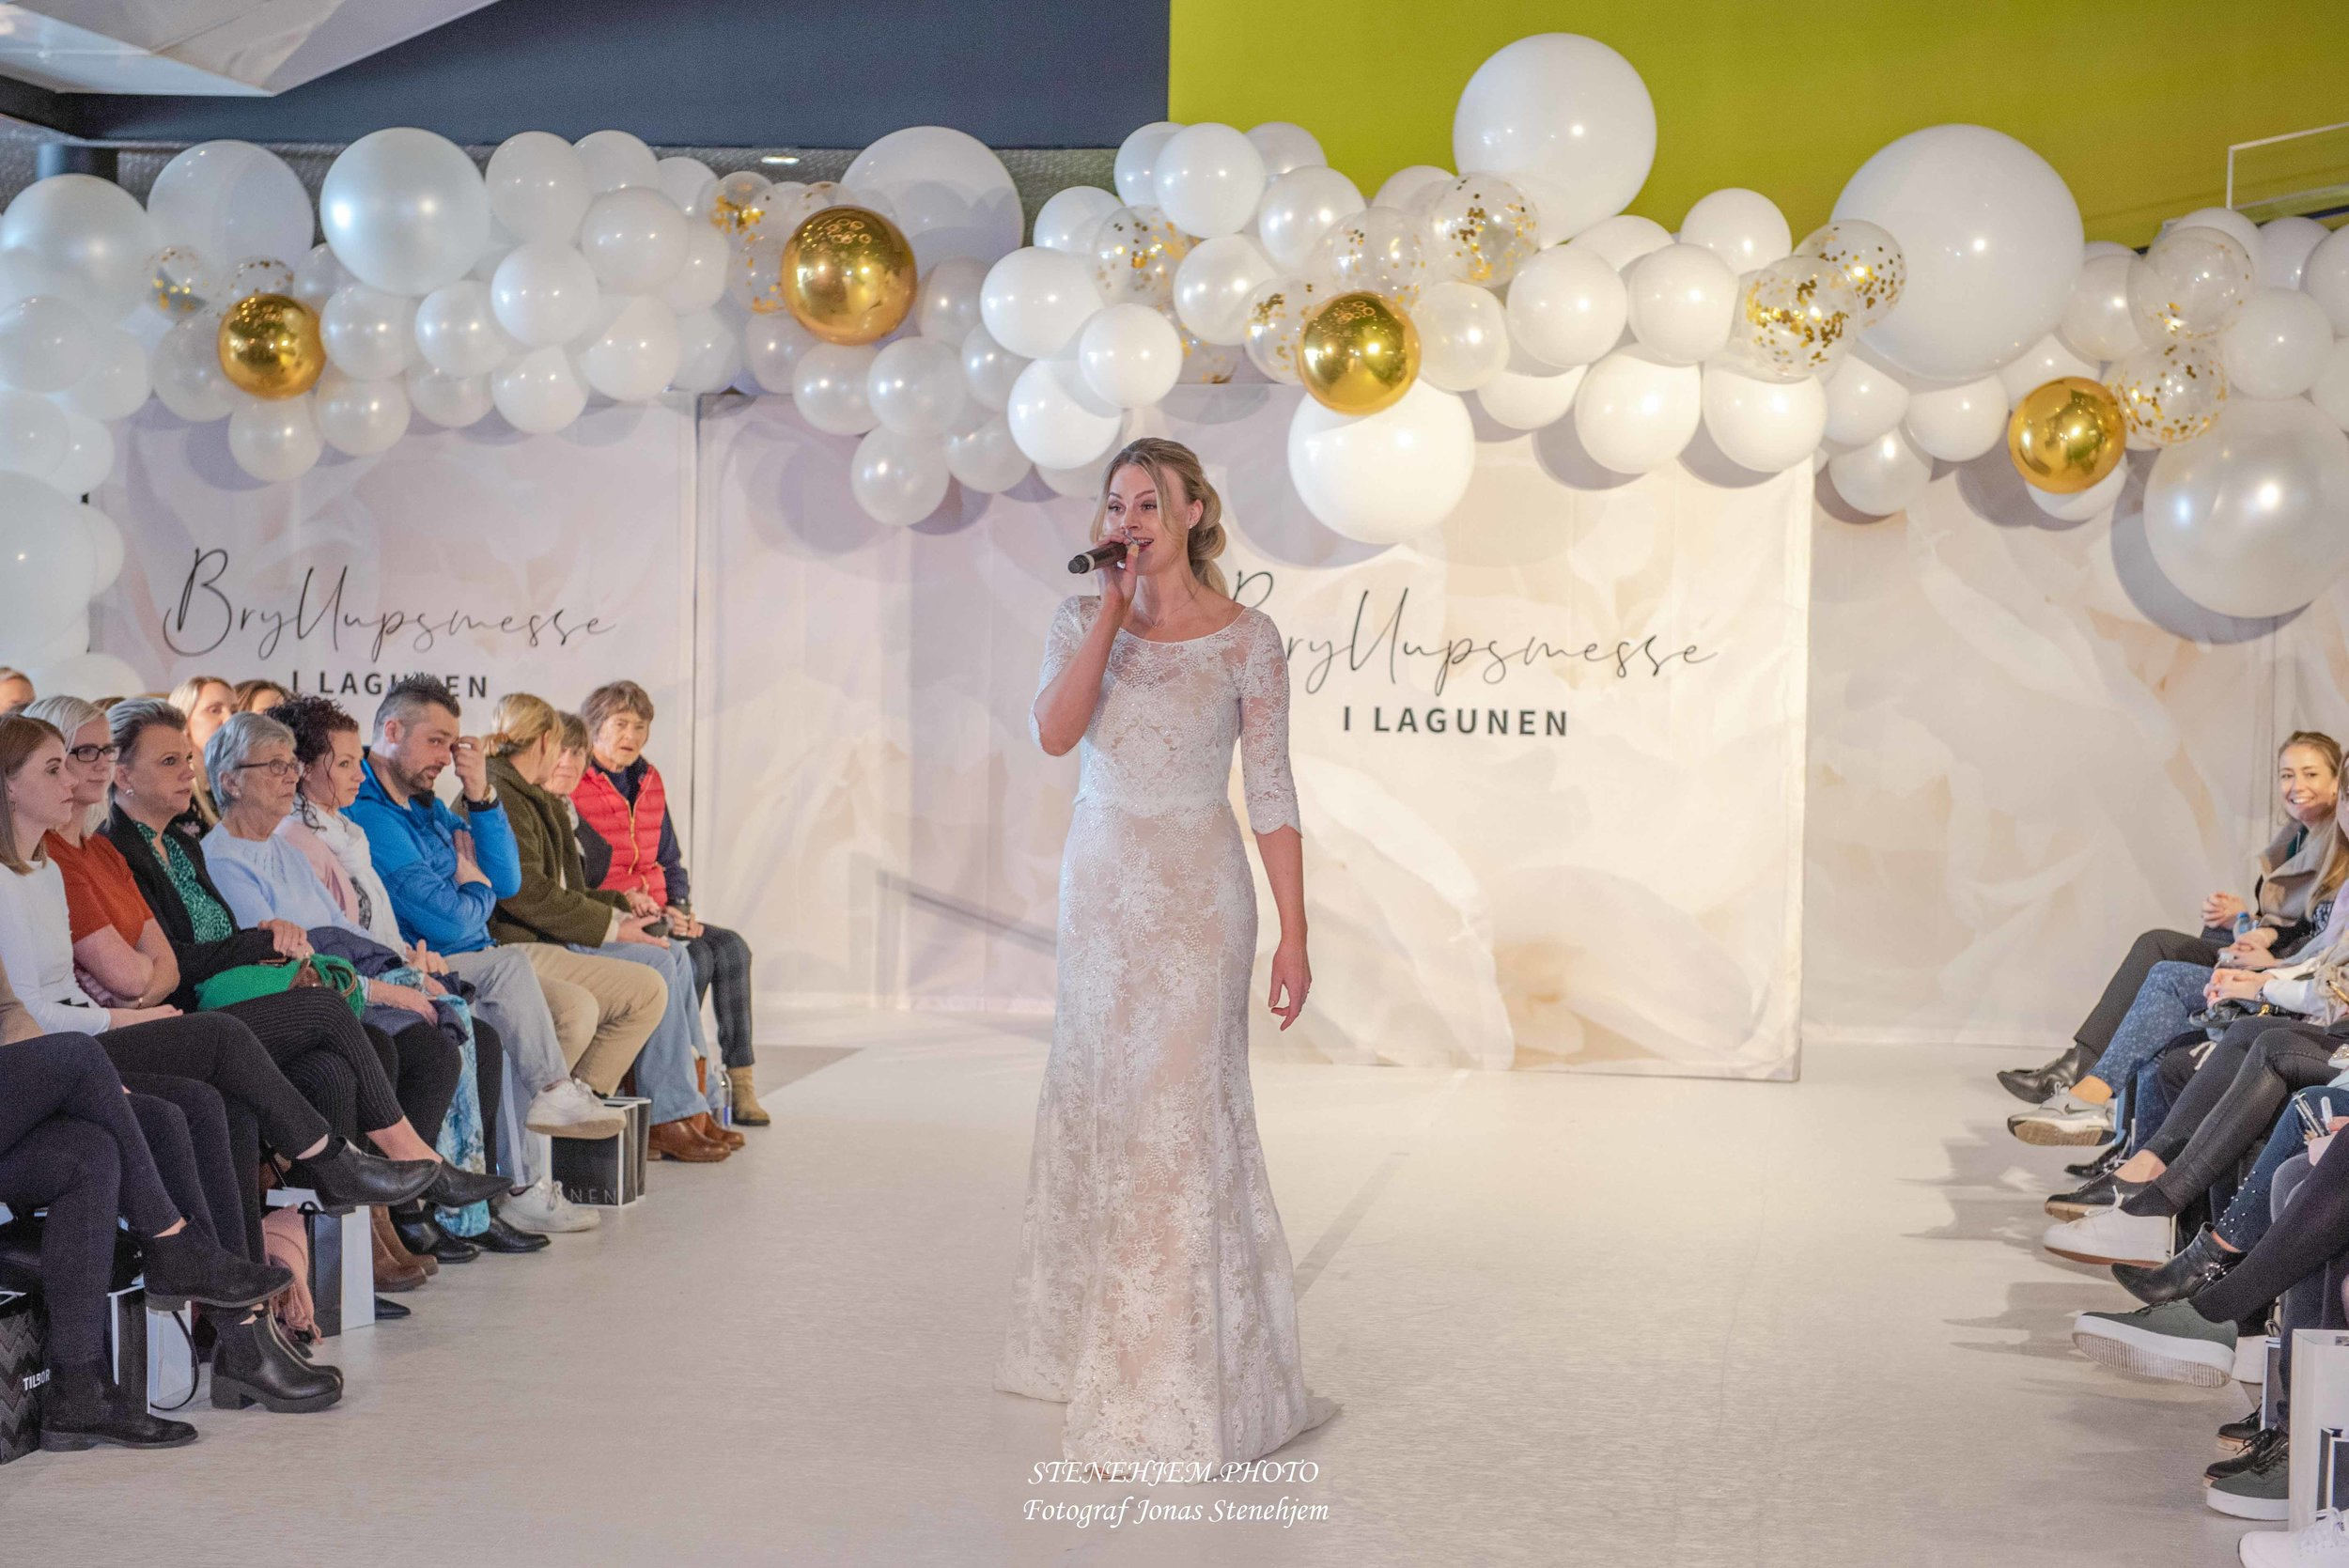 Bryllupsmesse_Lagunen_mittaltweddingfair__019.jpg